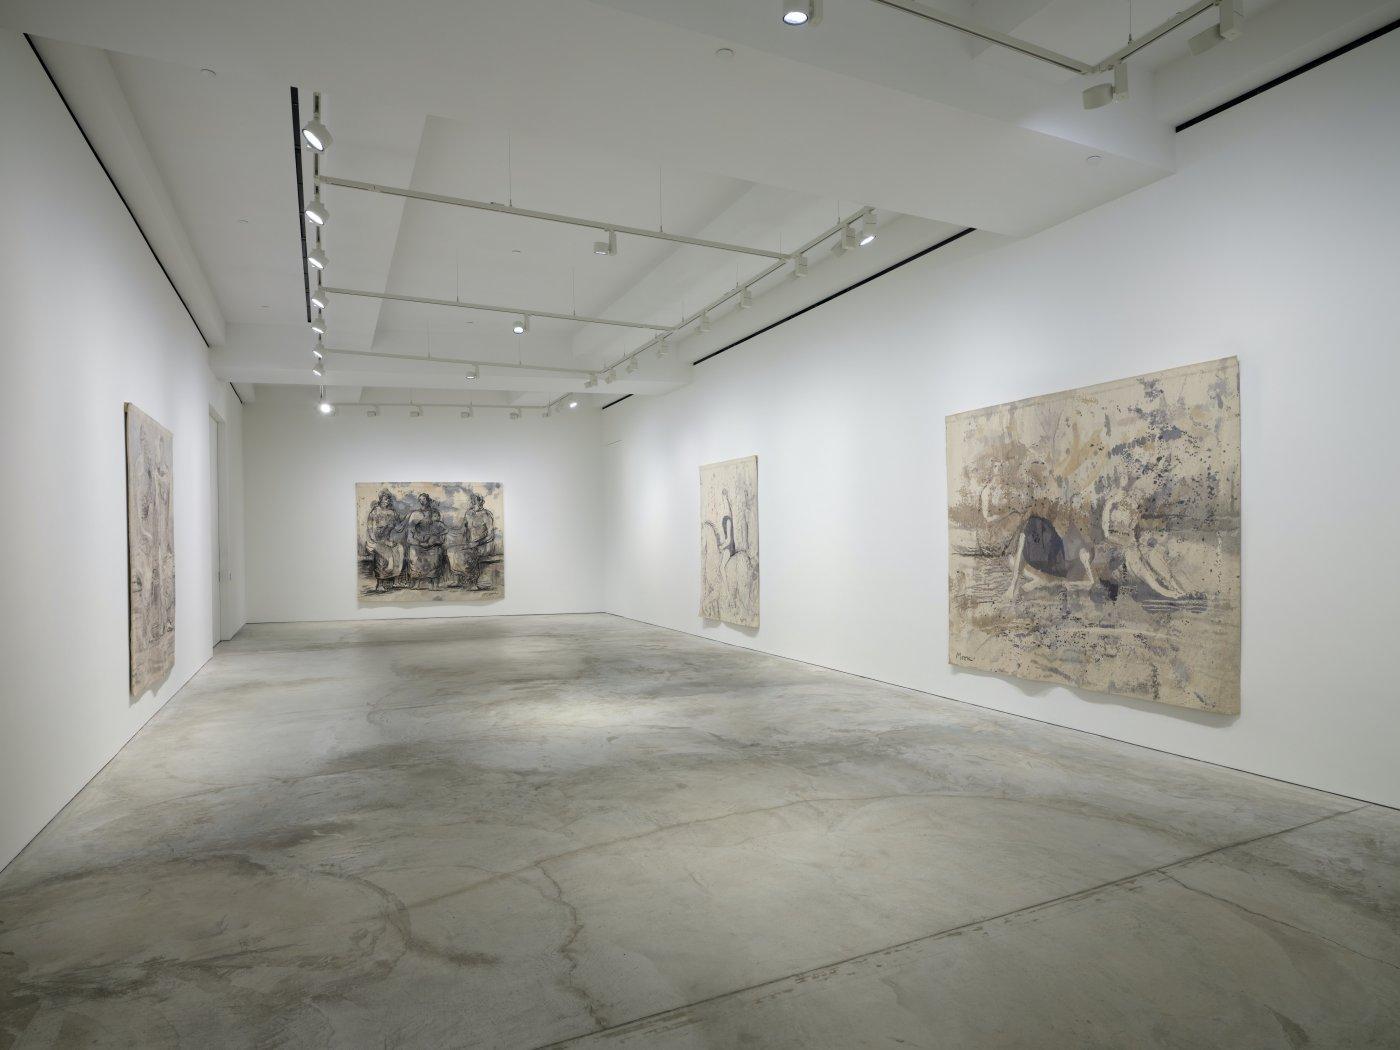 Hauser Wirth Hong Kong Henry Moore 6